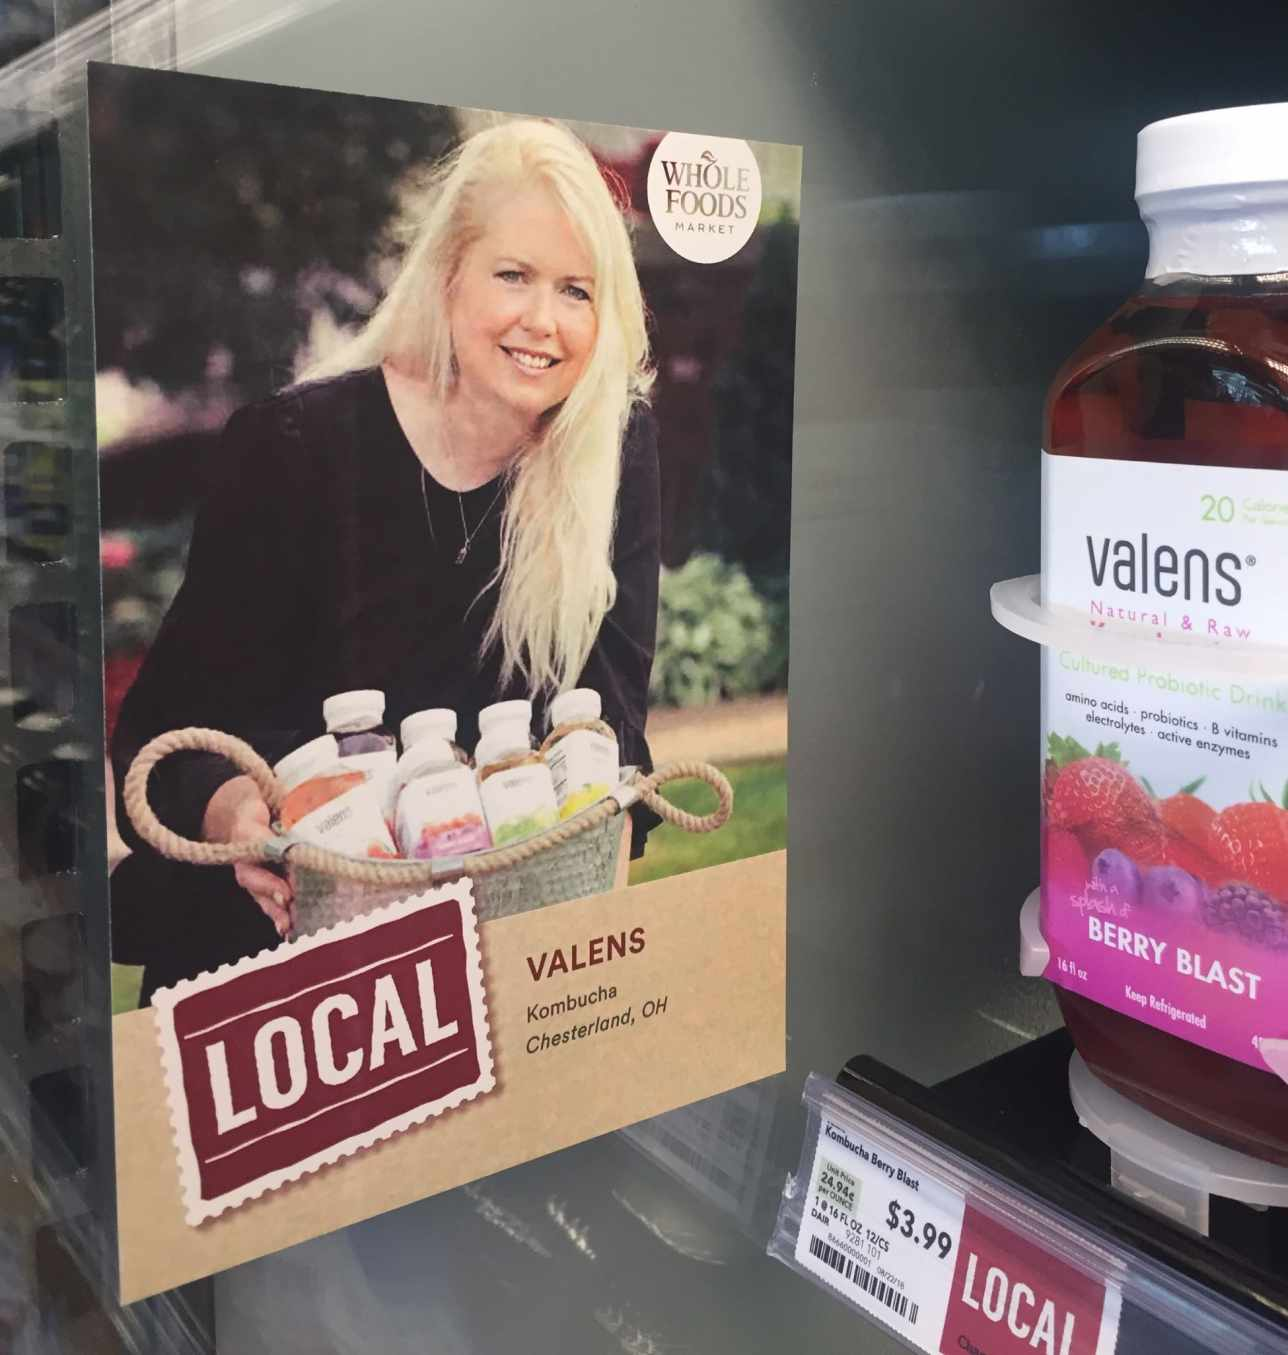 Valens at Whole Foods, Orange Village, OH